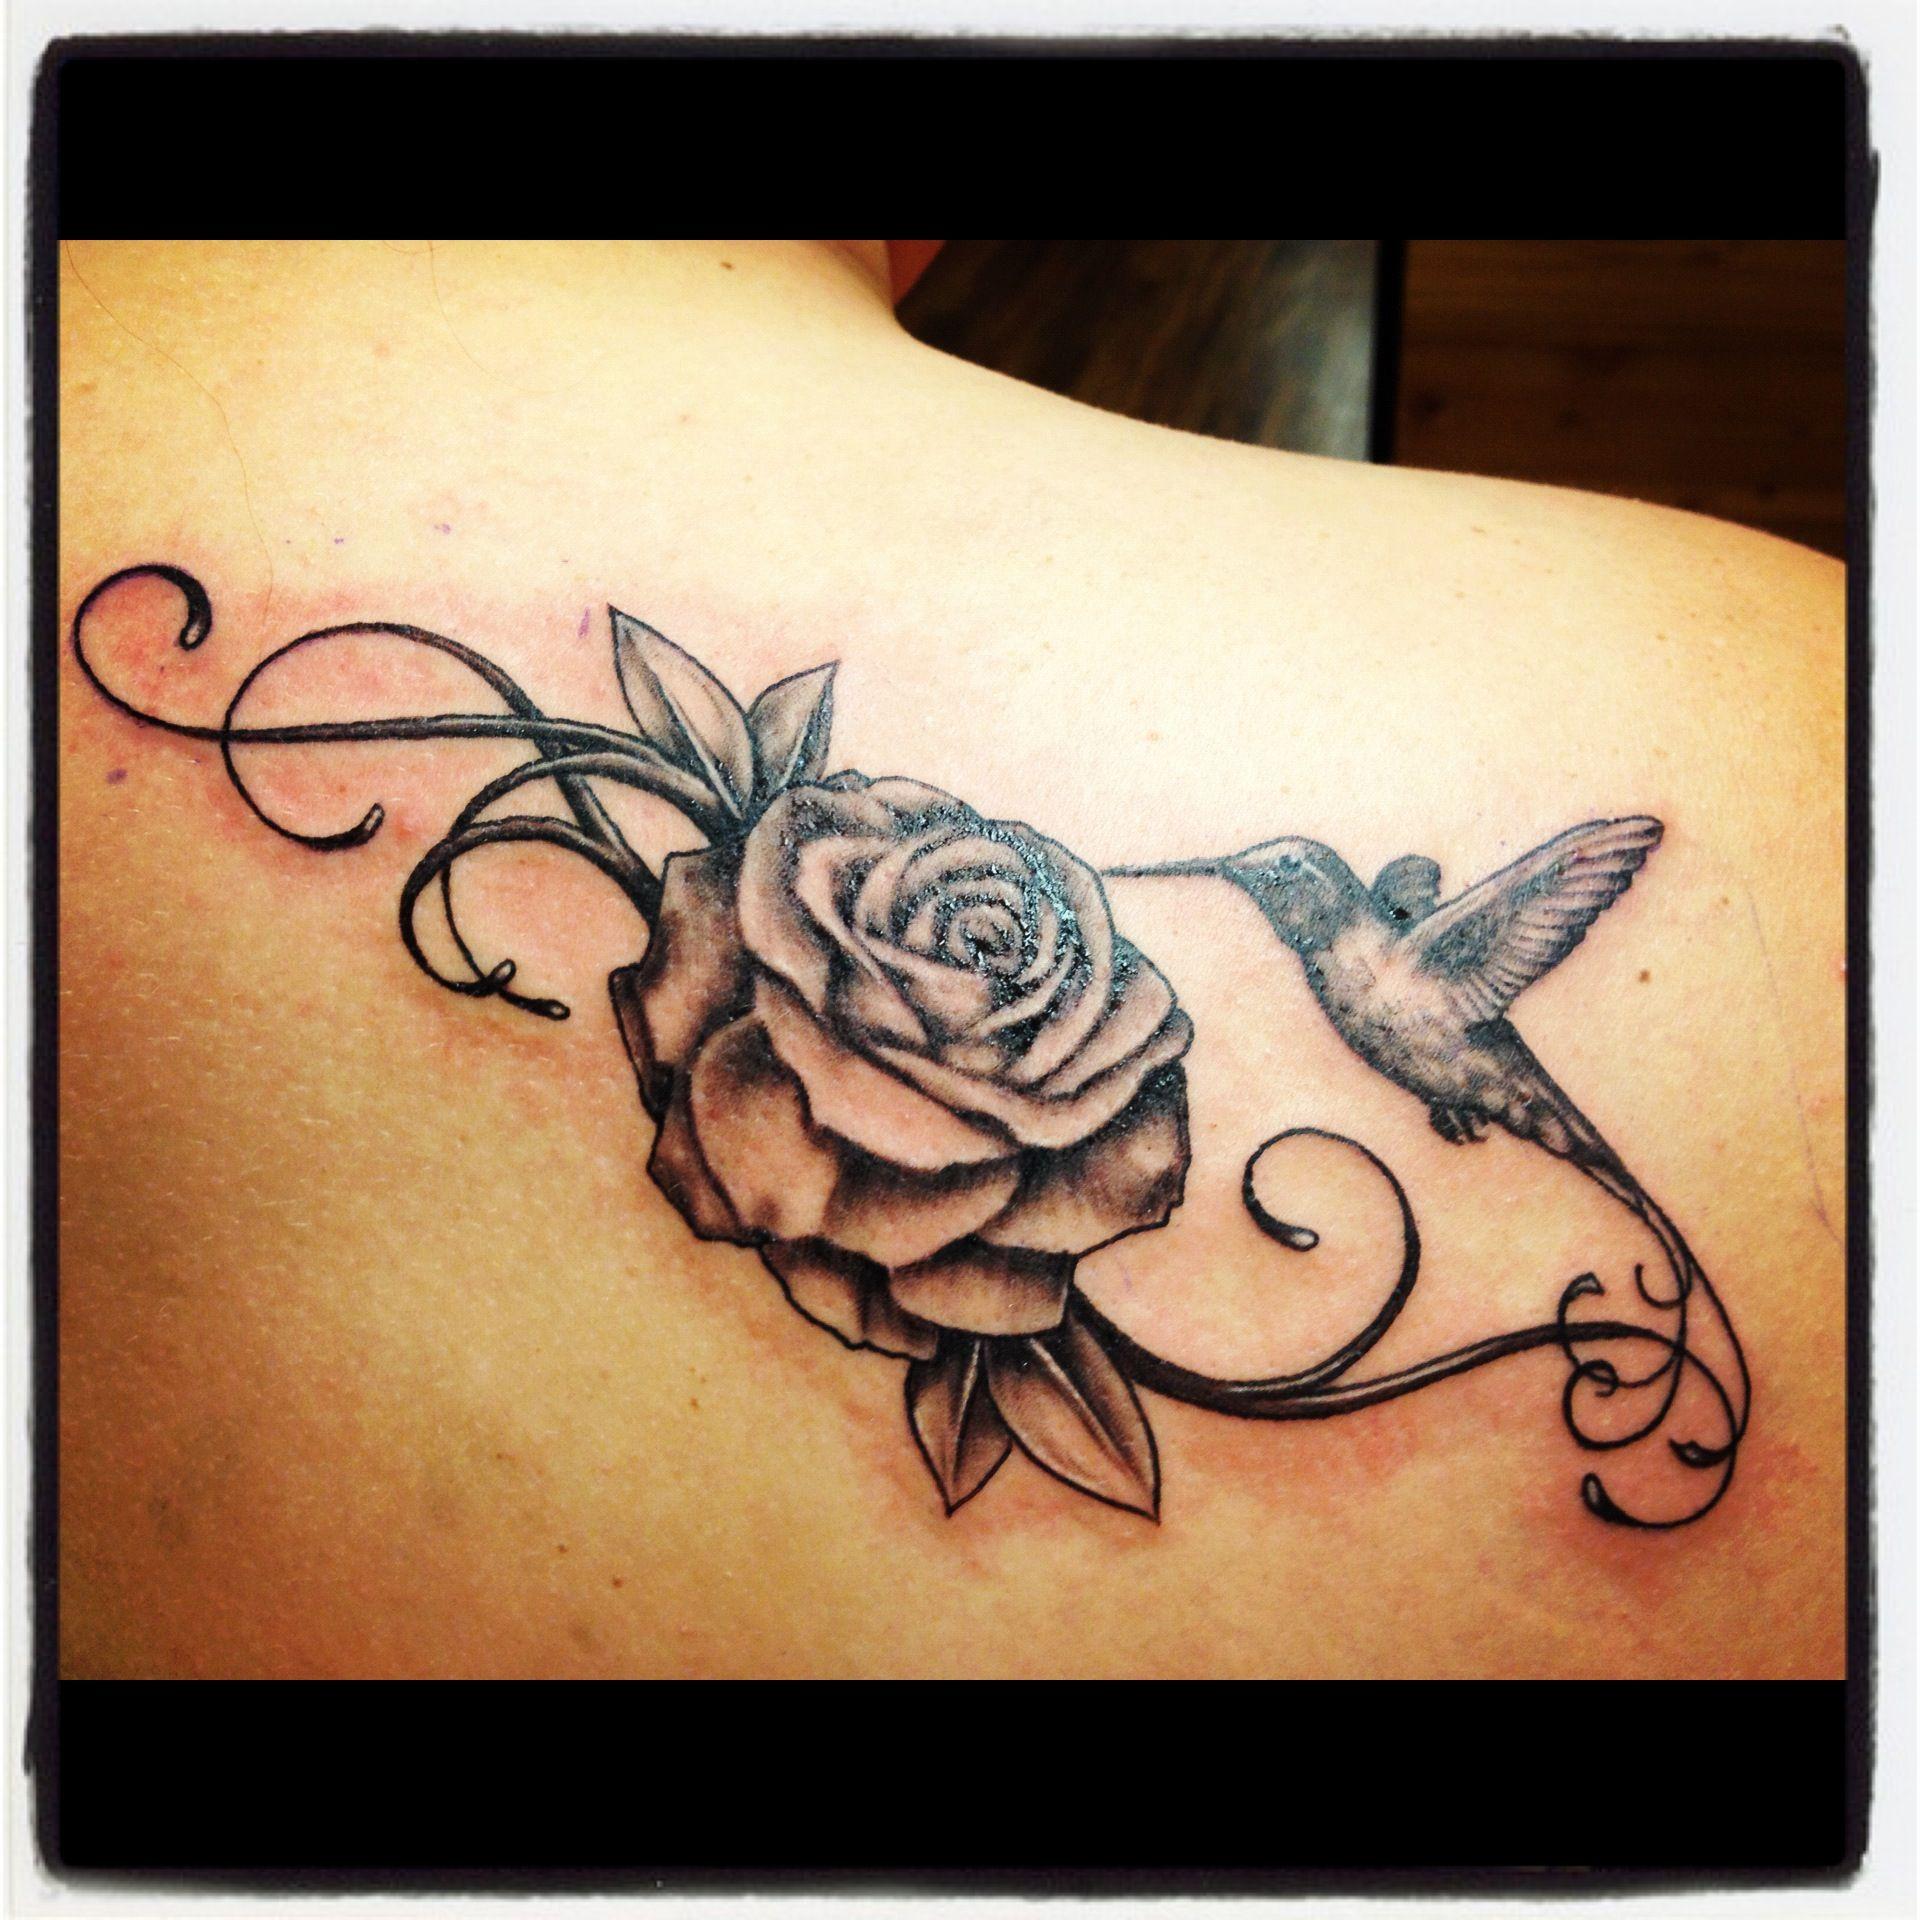 Hummingbird And Honeysuckle Tattoo Honeysuckle tattoo always